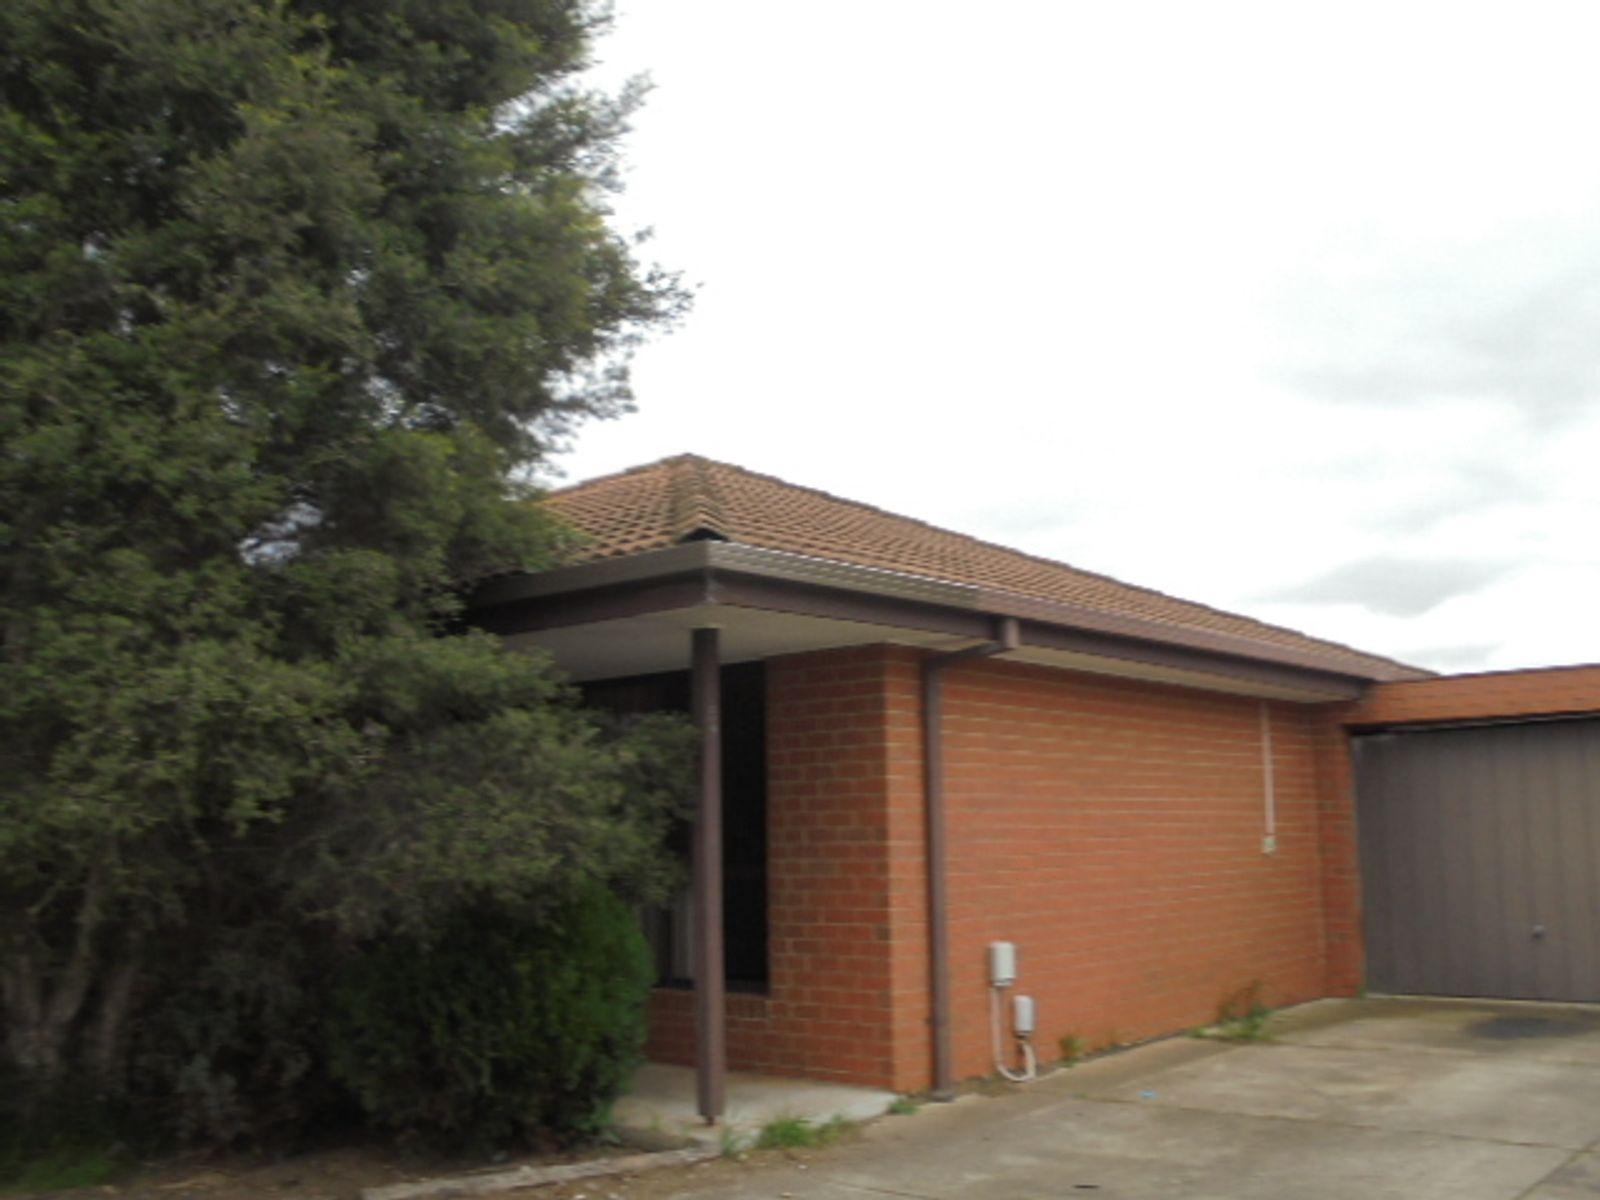 2/58 Unitt Street, Melton, VIC 3337